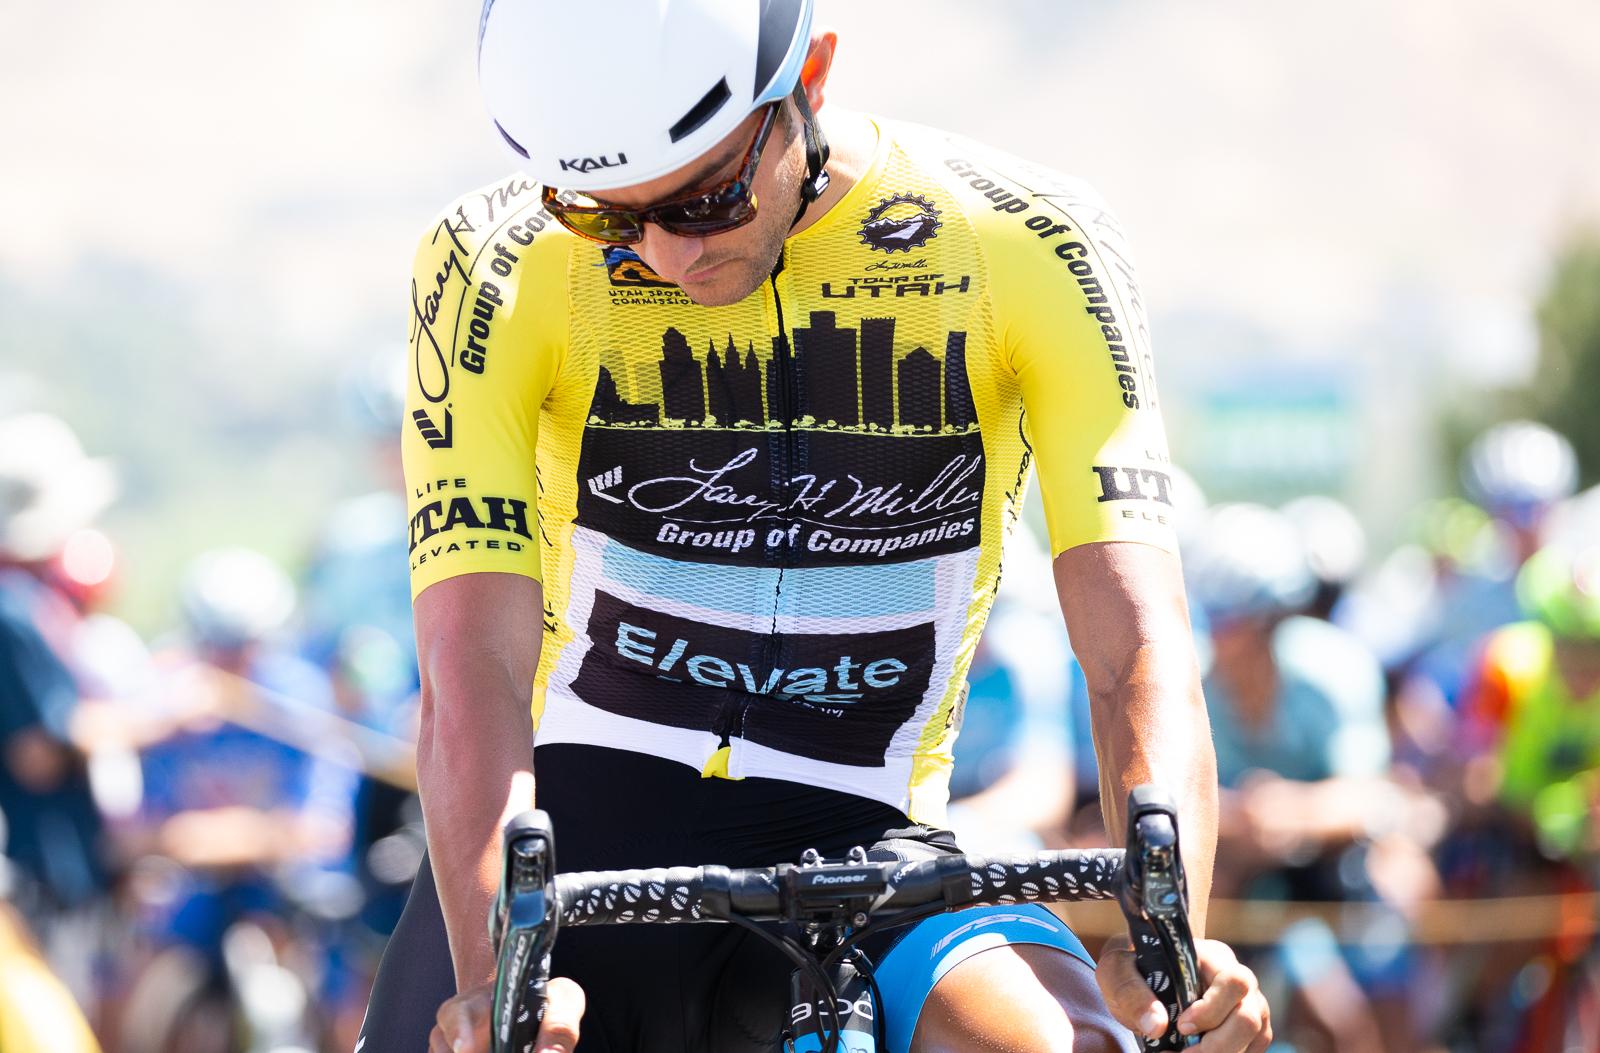 James Piccoli (Elevate KHS) lines up before the start. Photo: Cathy Fegan-Kim